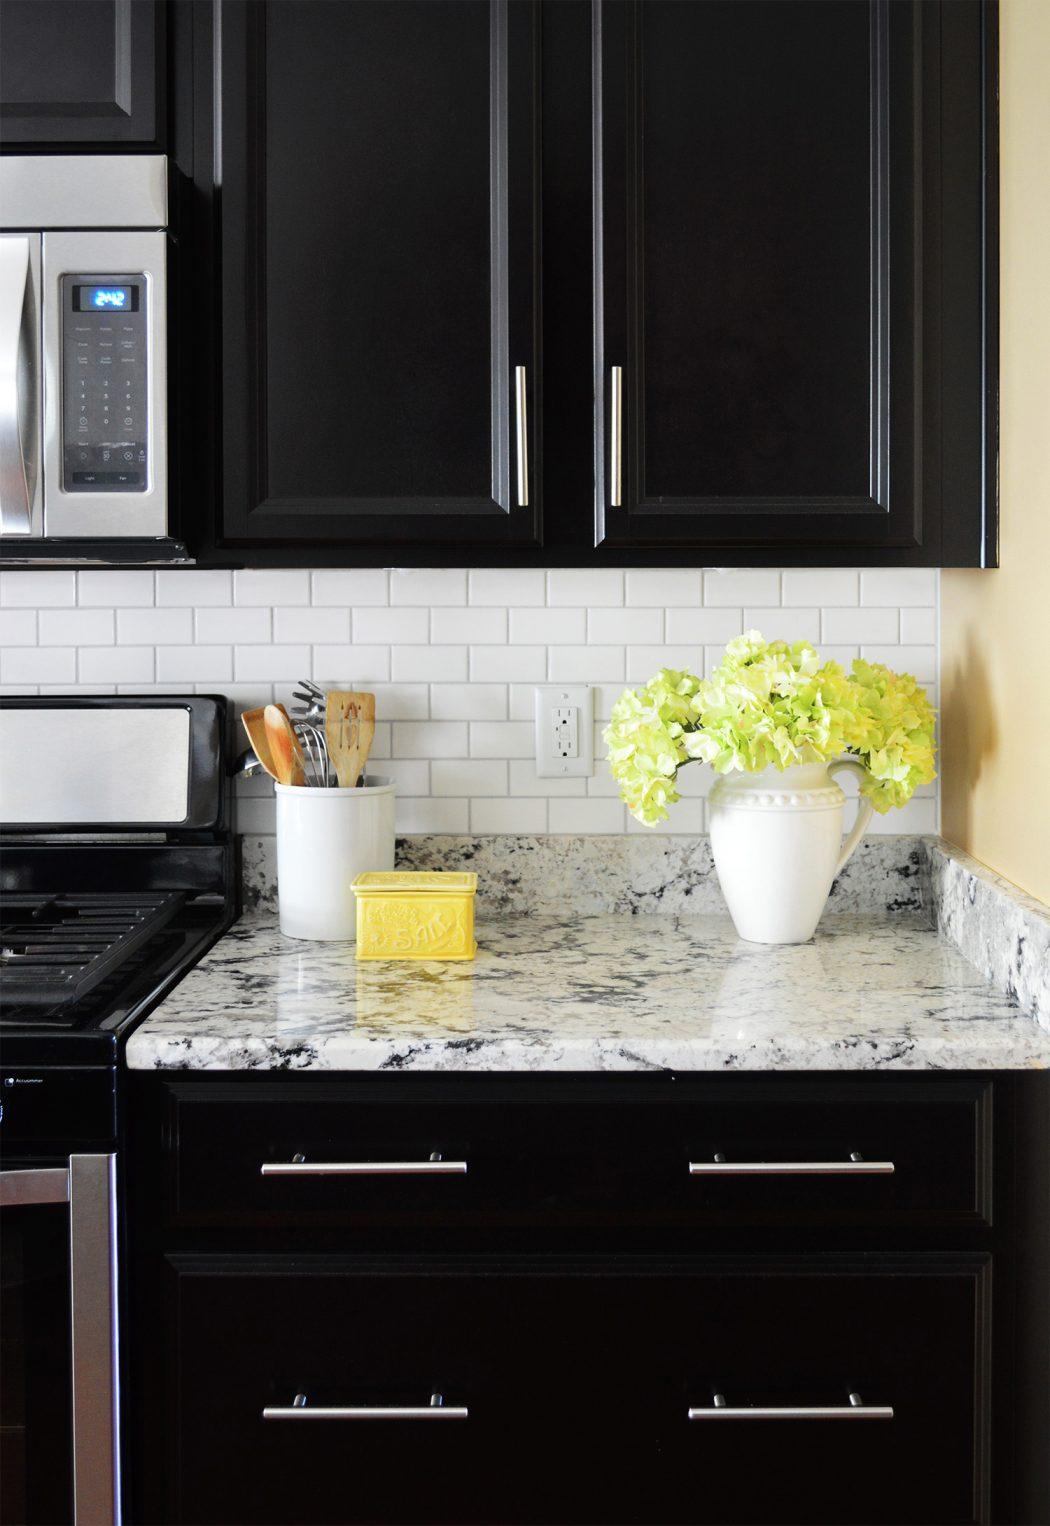 ideas fan brands hanging vent countertop wooden hoods kitchen range granite cream stainless flooring laminate black backsplash brown steel stove countertops dark tile best hood